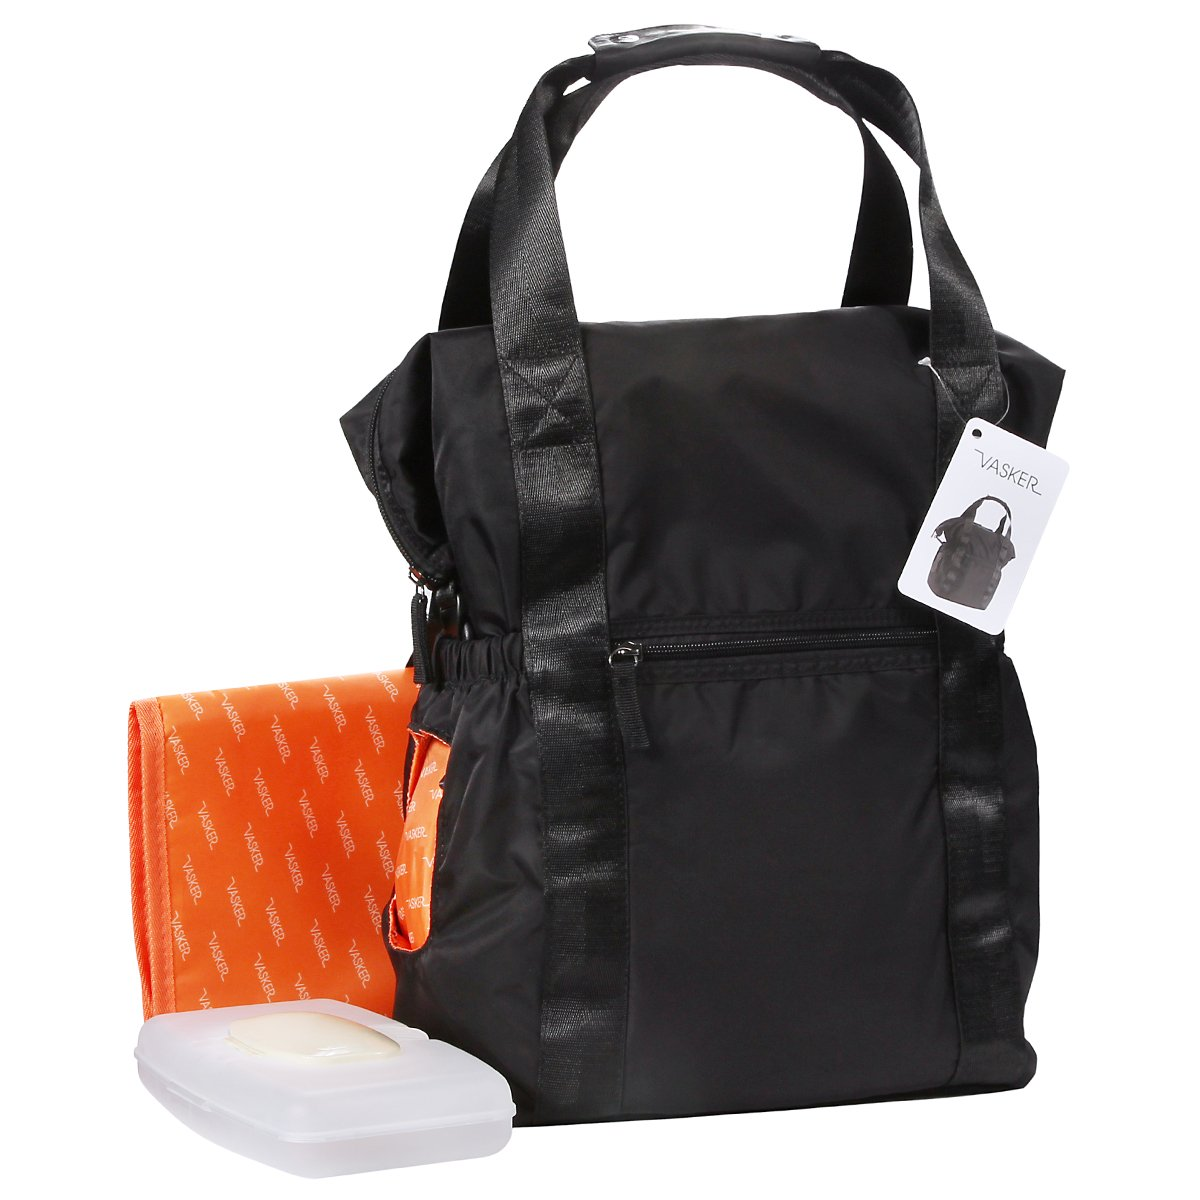 VASKER Baby Diaper Bag Backpack Nappy Bag Multifunction Water Resistant Organizer Travel Bag for Dad and Mom Stroller Straps Men Women Black Nylon